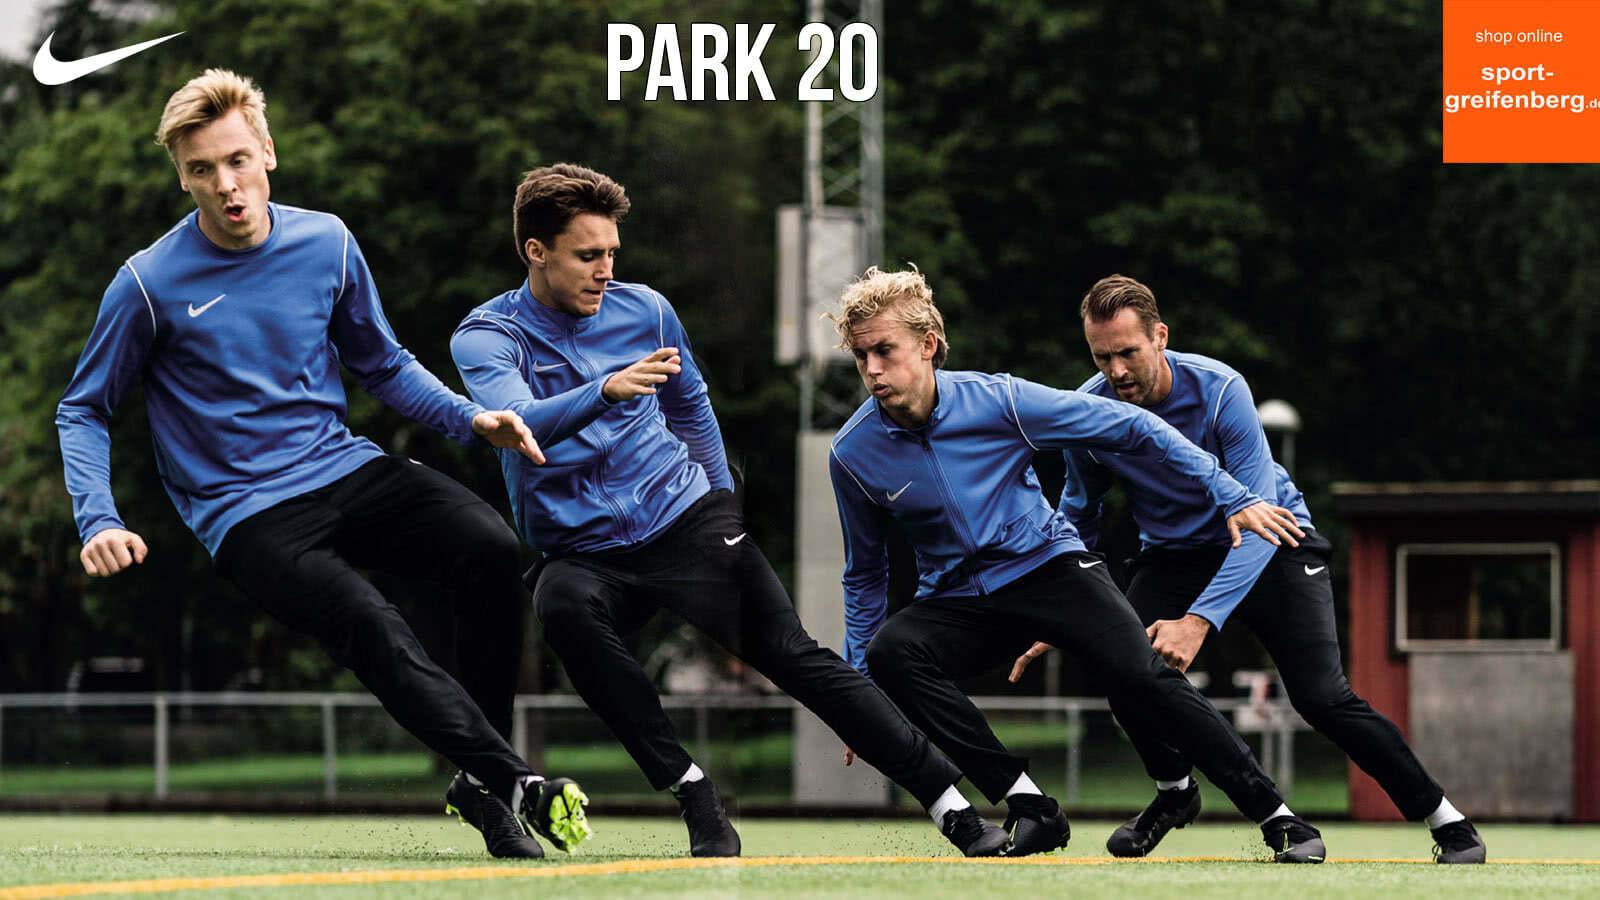 Nike Park 20 Teamline